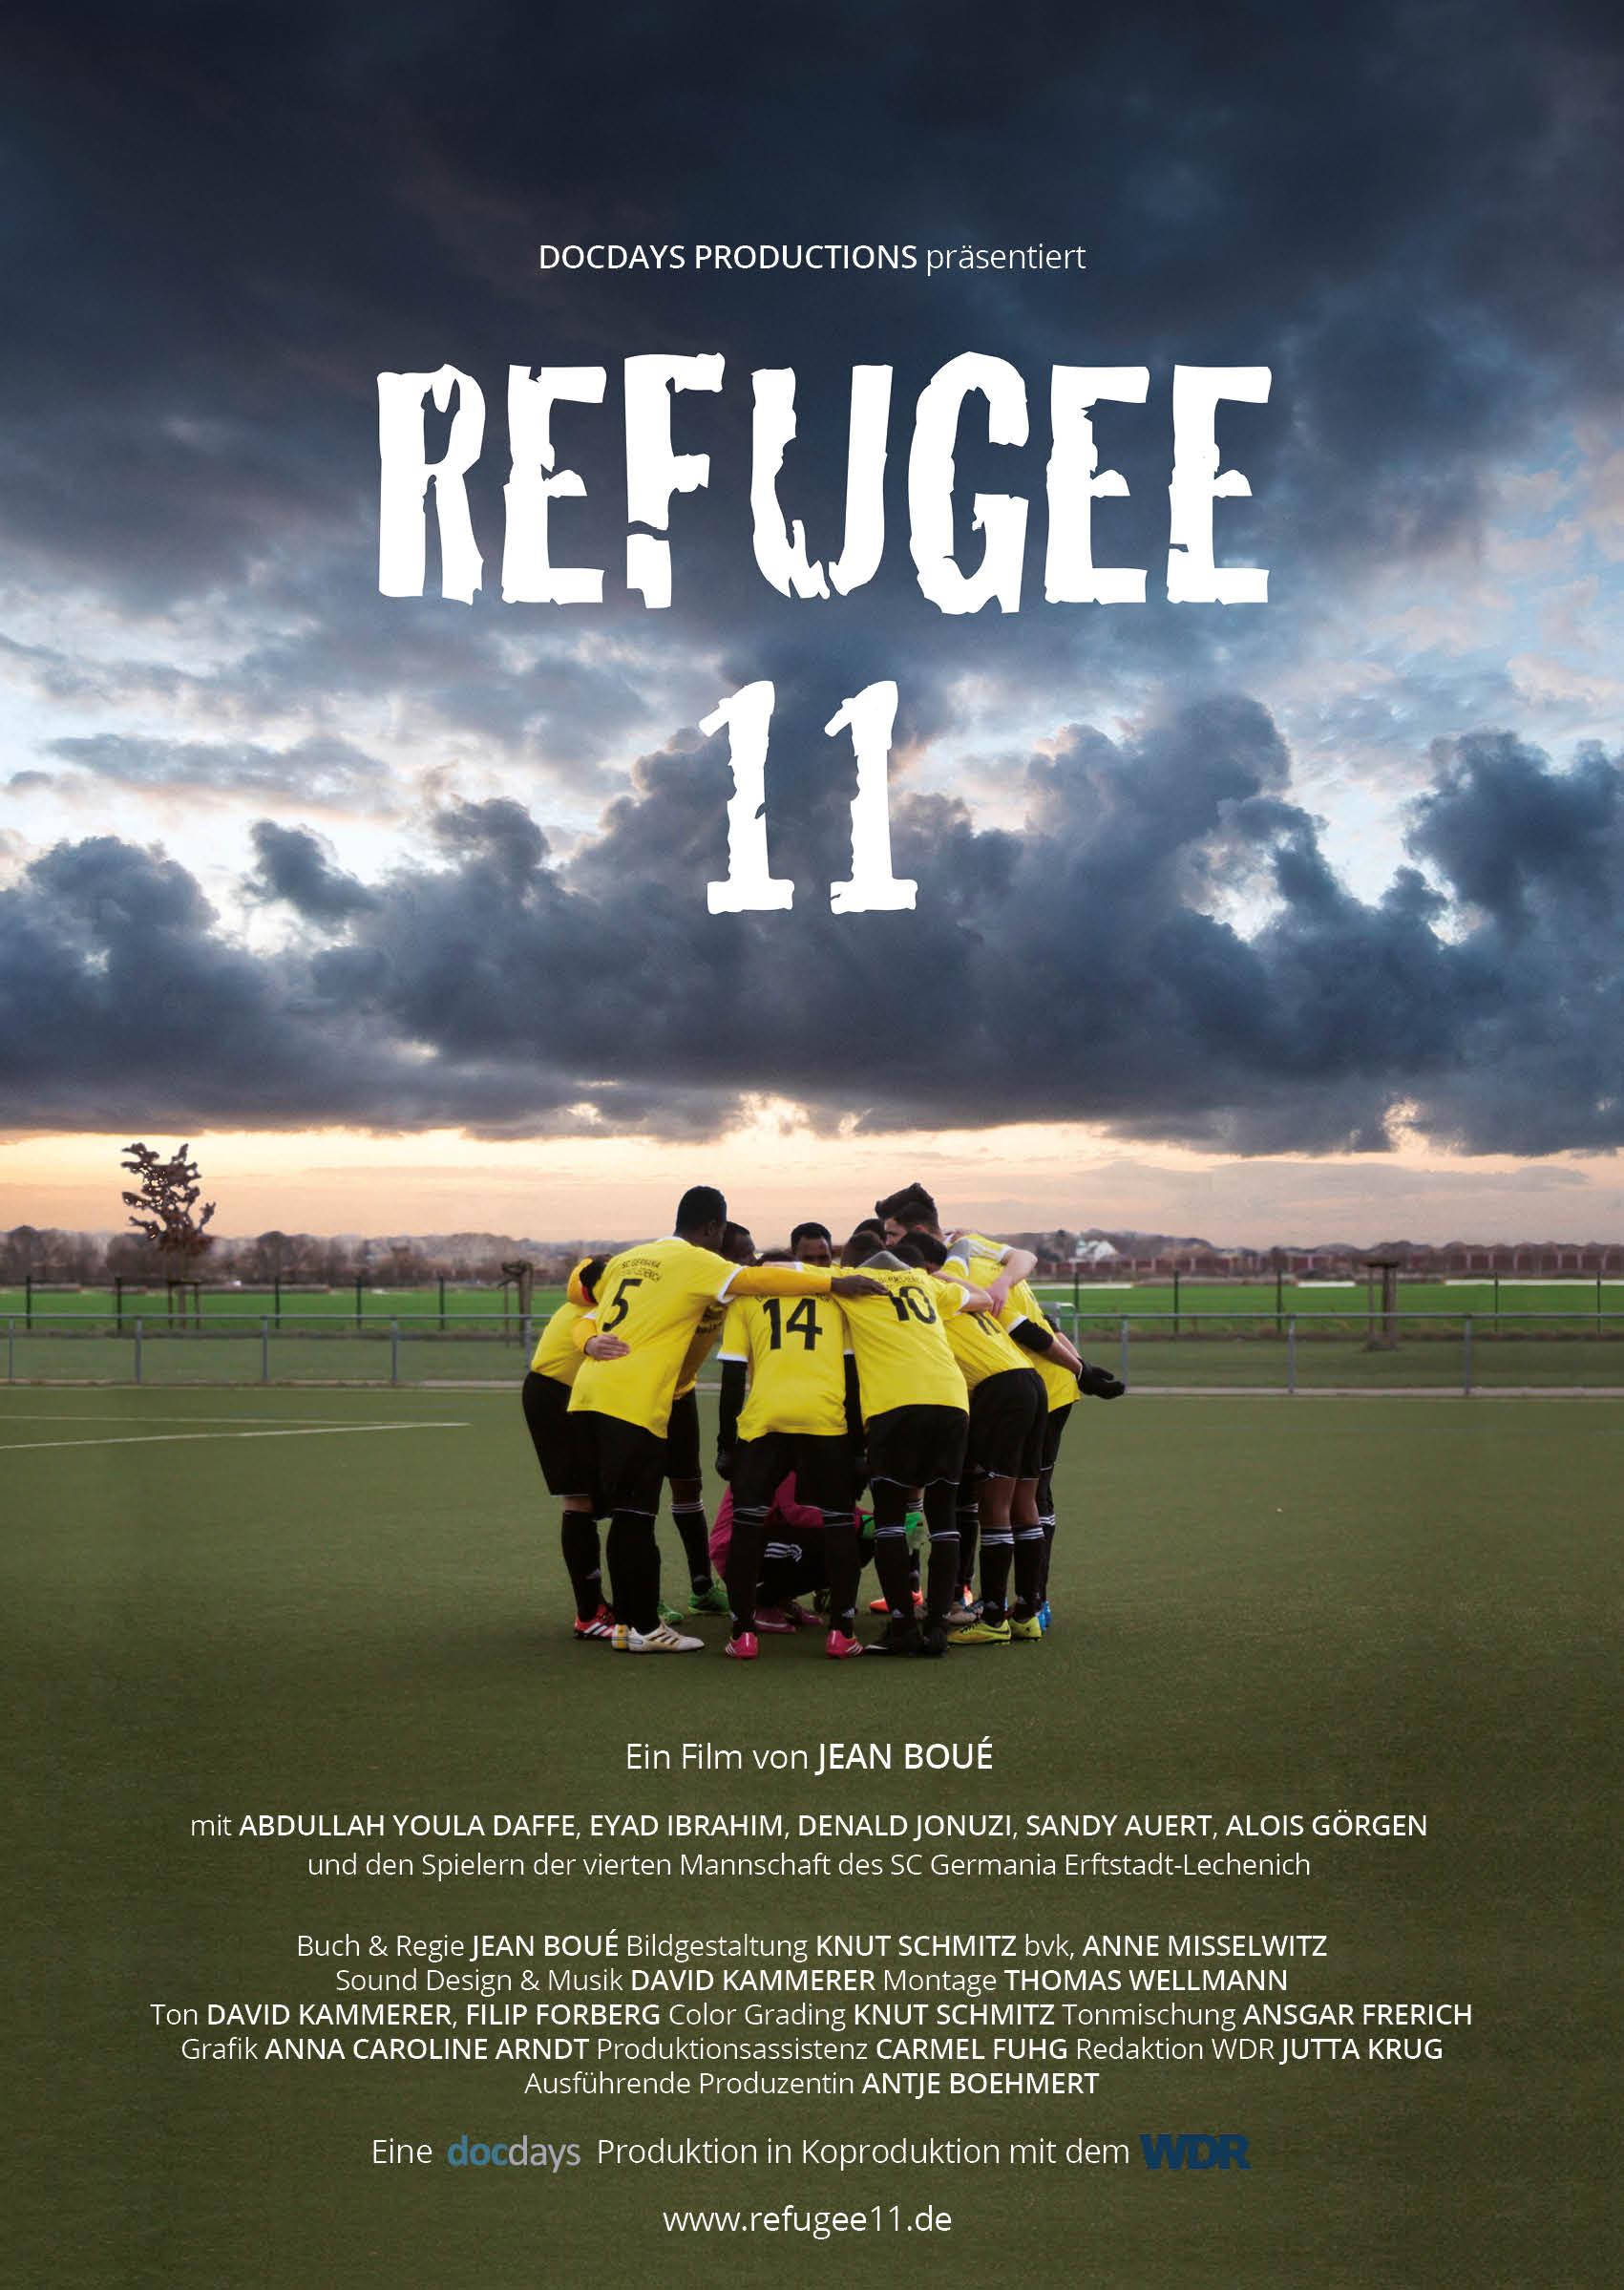 Filmplakat Refugee 11 - Kamerafrau Anne Misselwitz